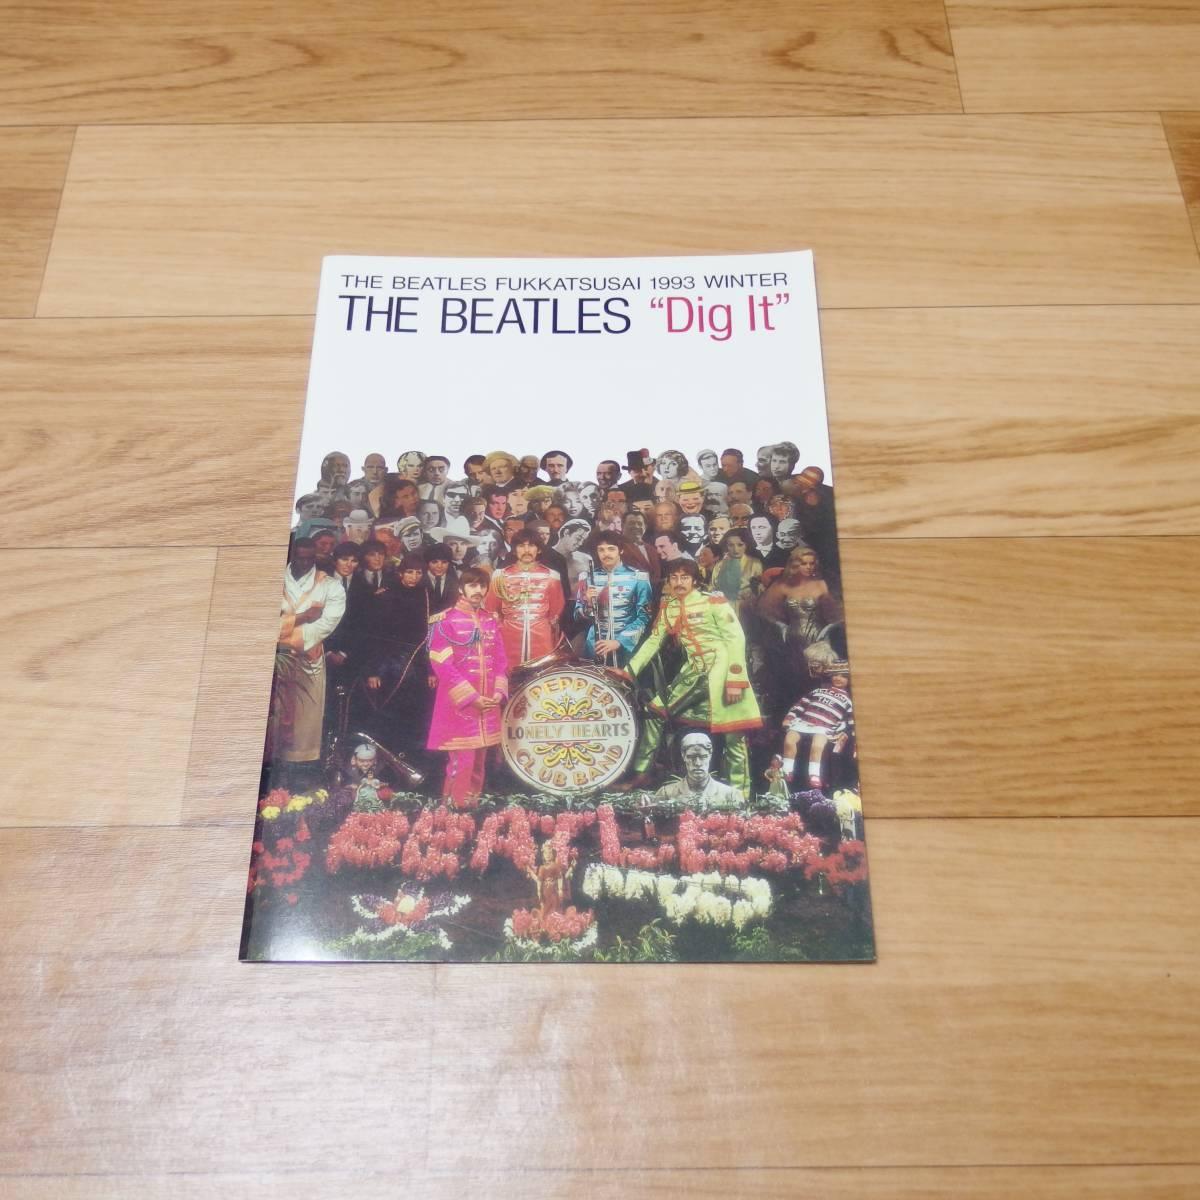 The Beatles/ビートルズ復活祭パンフレット 1993年